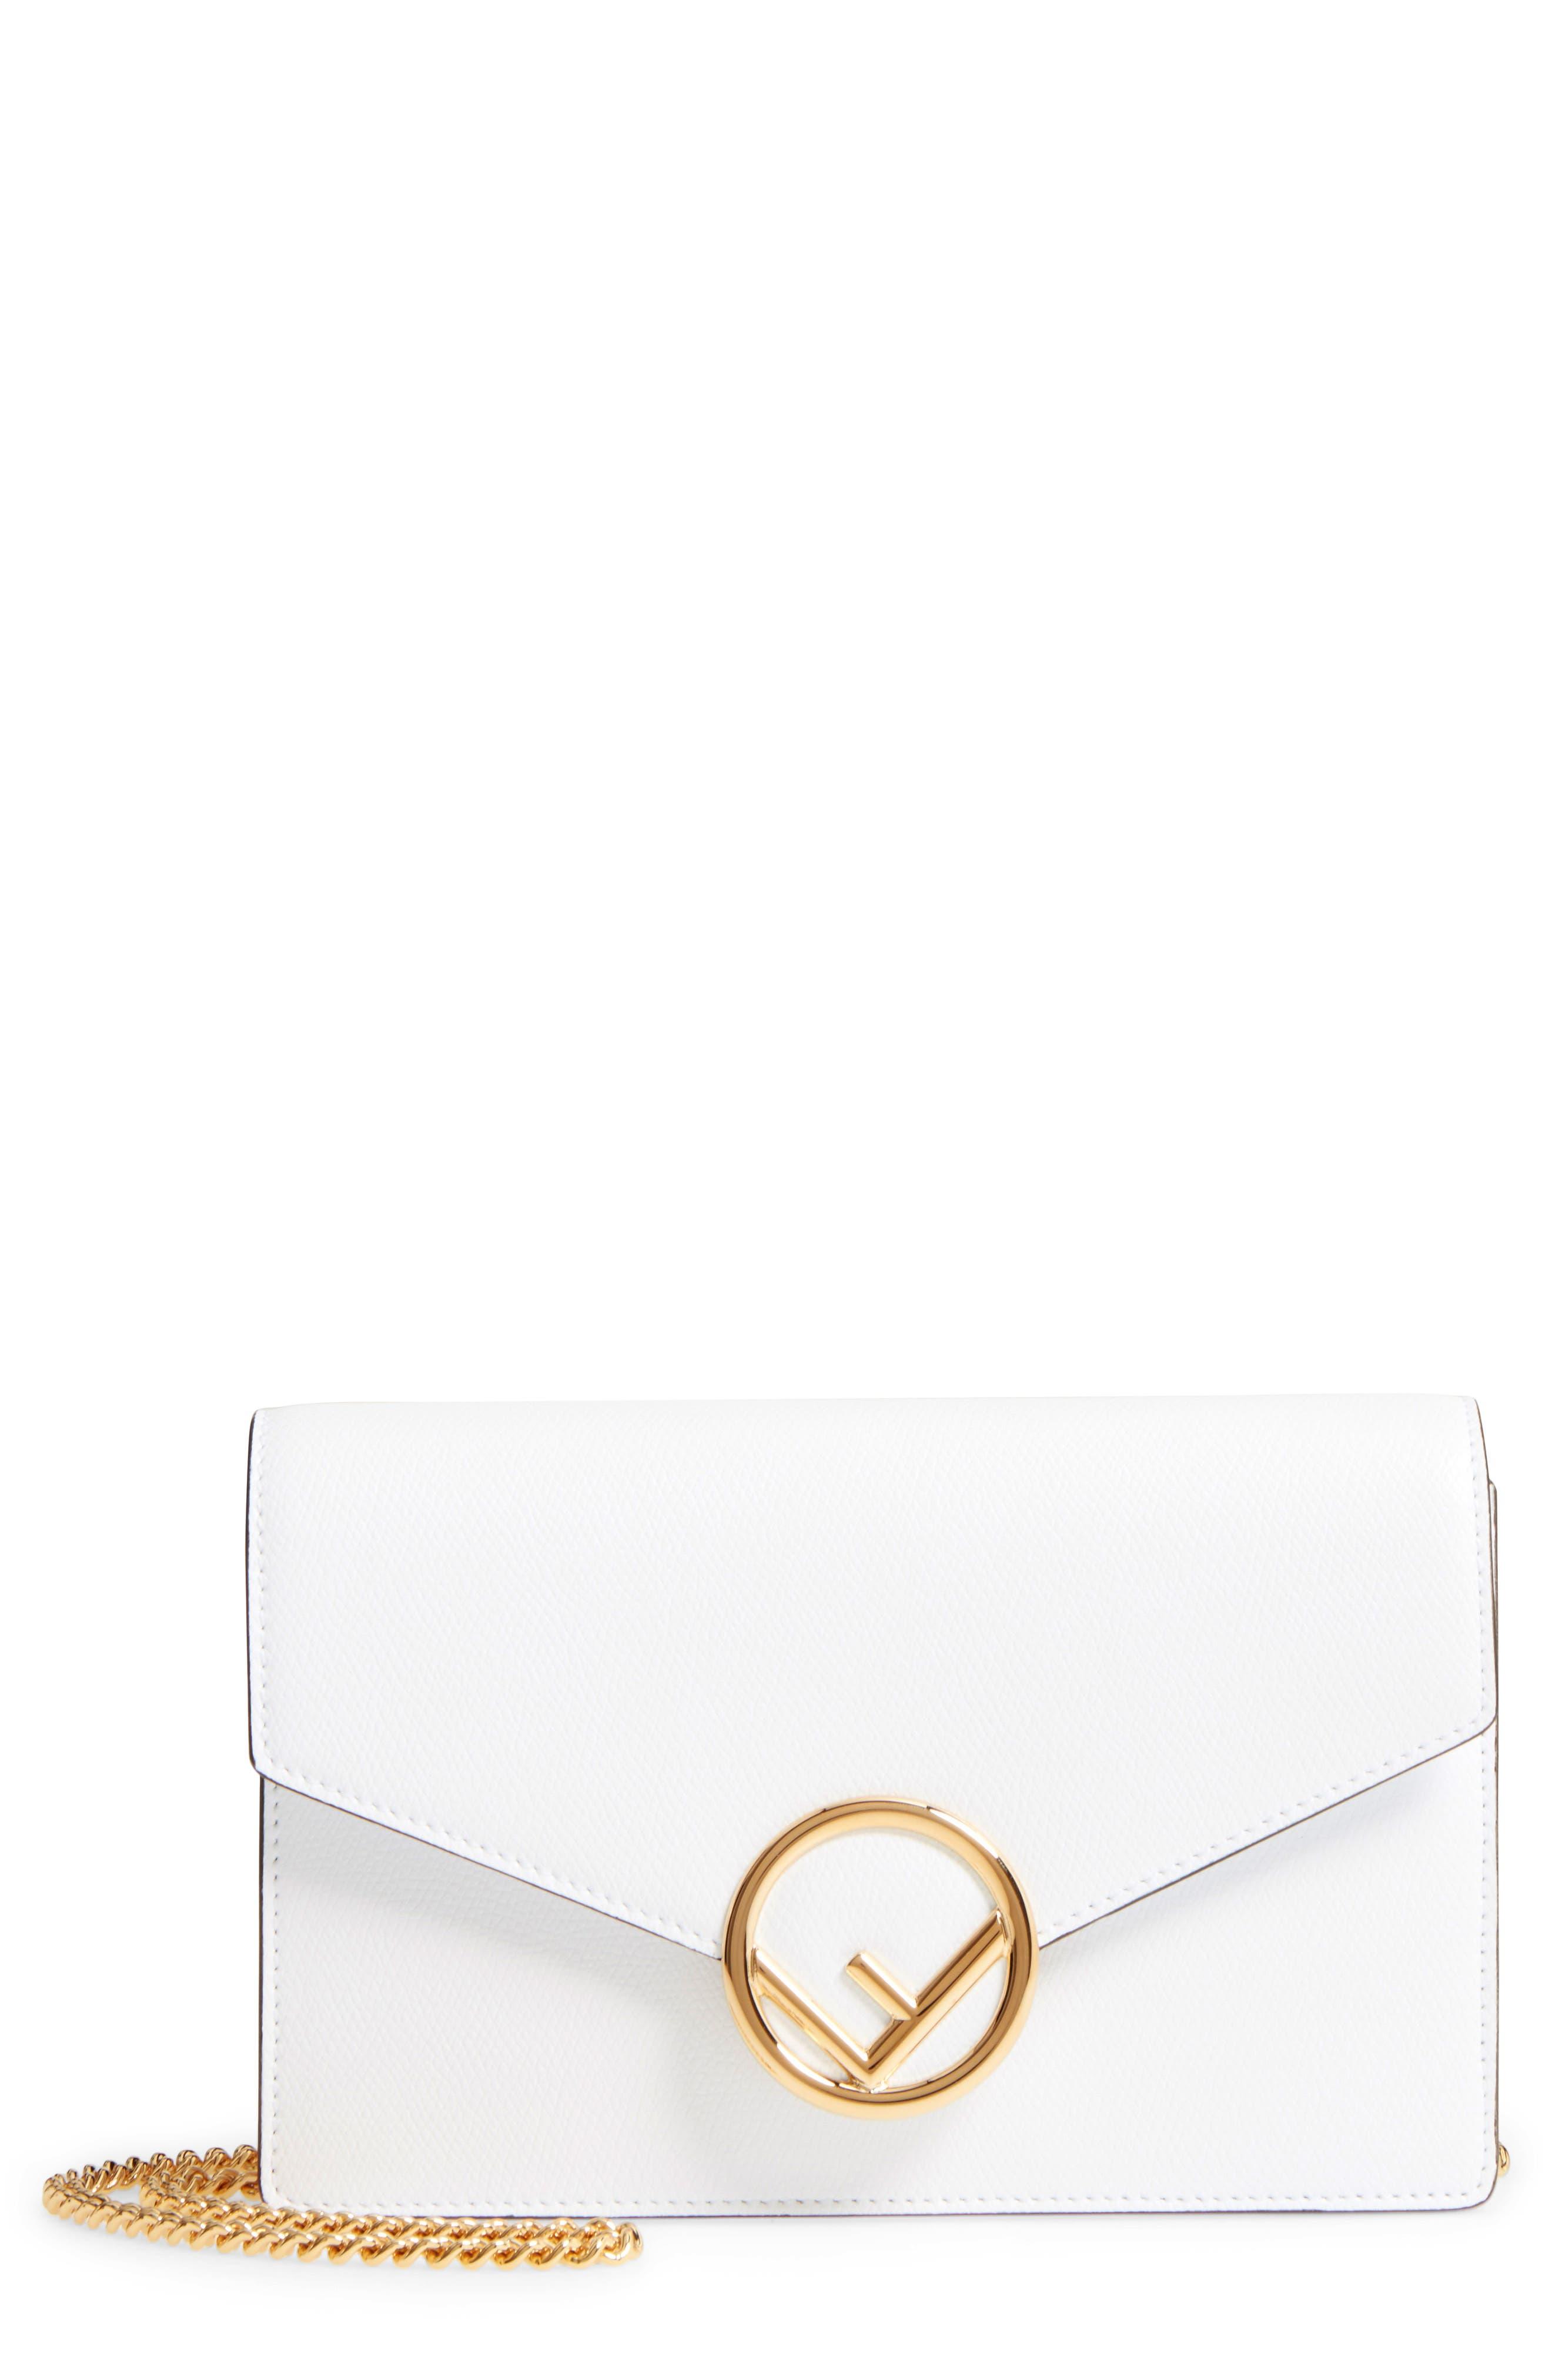 Main Image - Fendi Liberty Logo Leather Wallet on a Chain